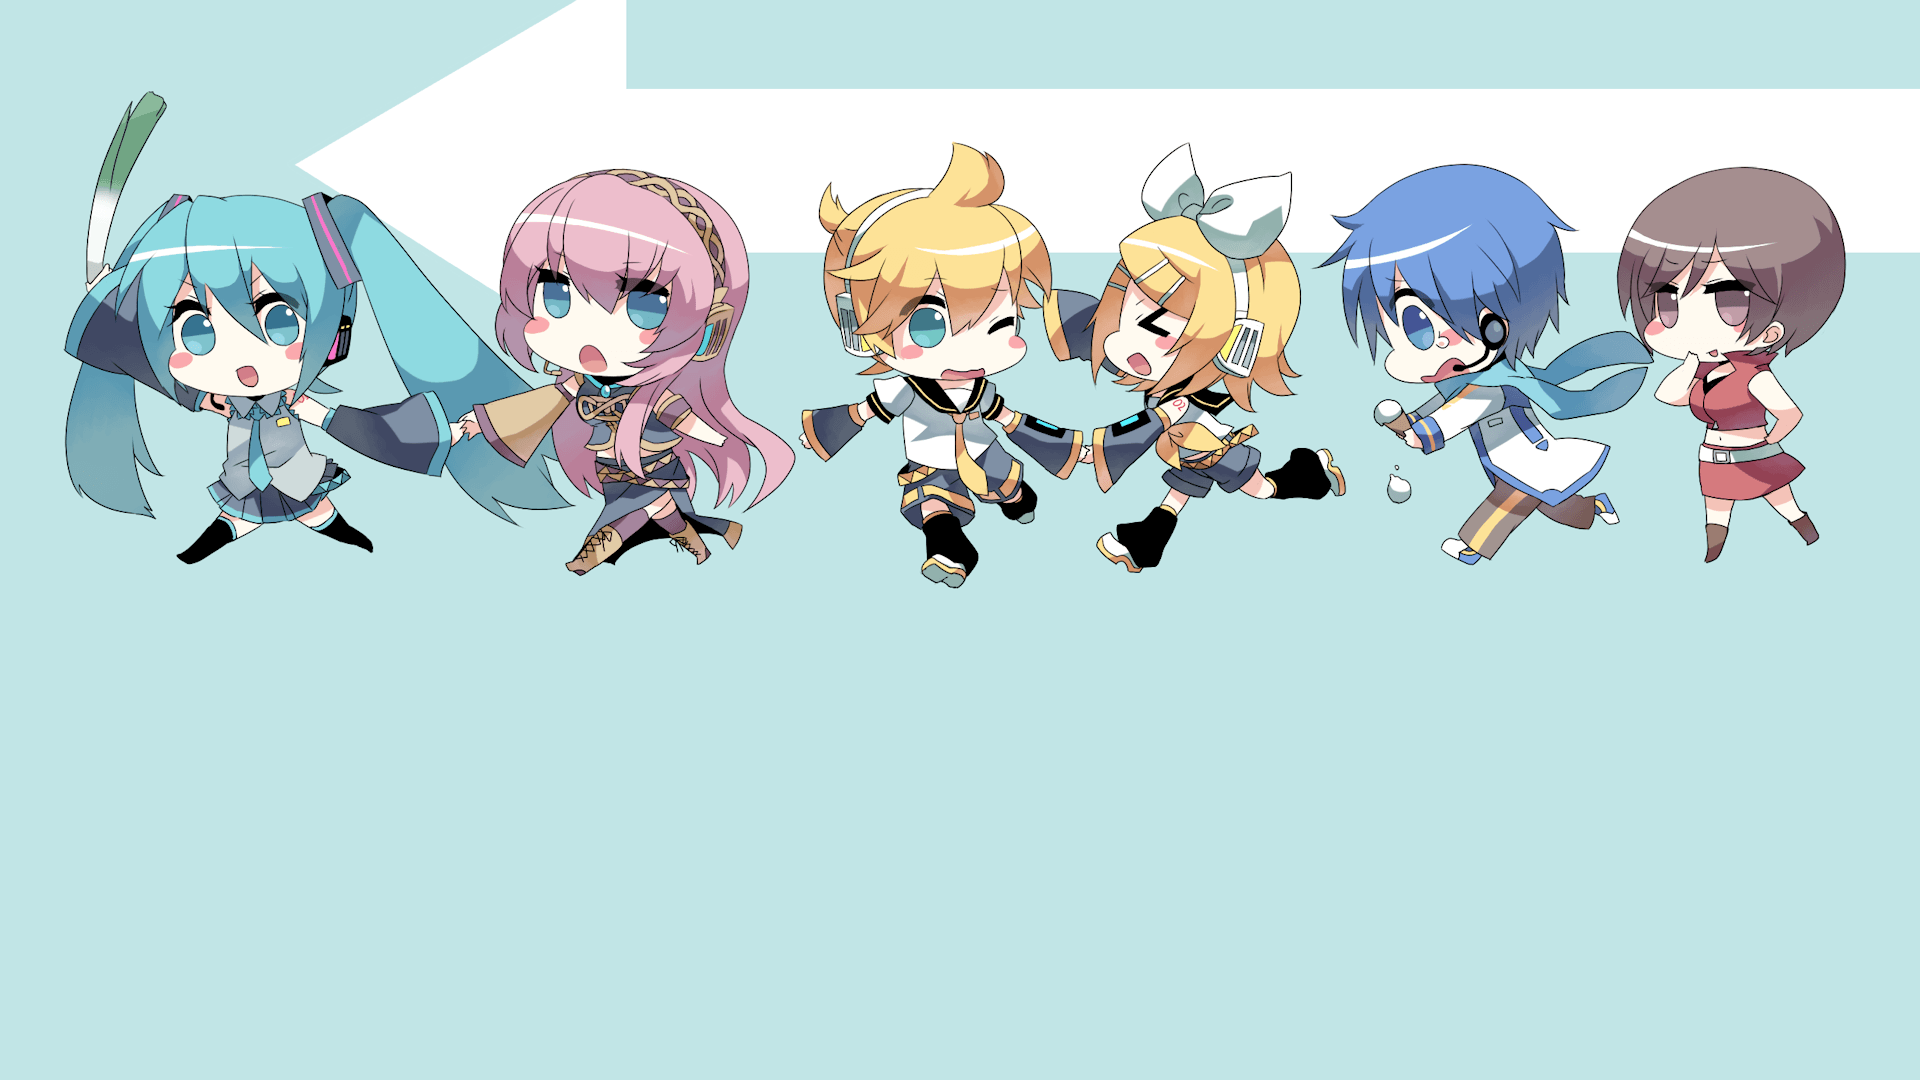 Backgrounds anime chibi wallpaper cave - Chibi wallpaper hd ...